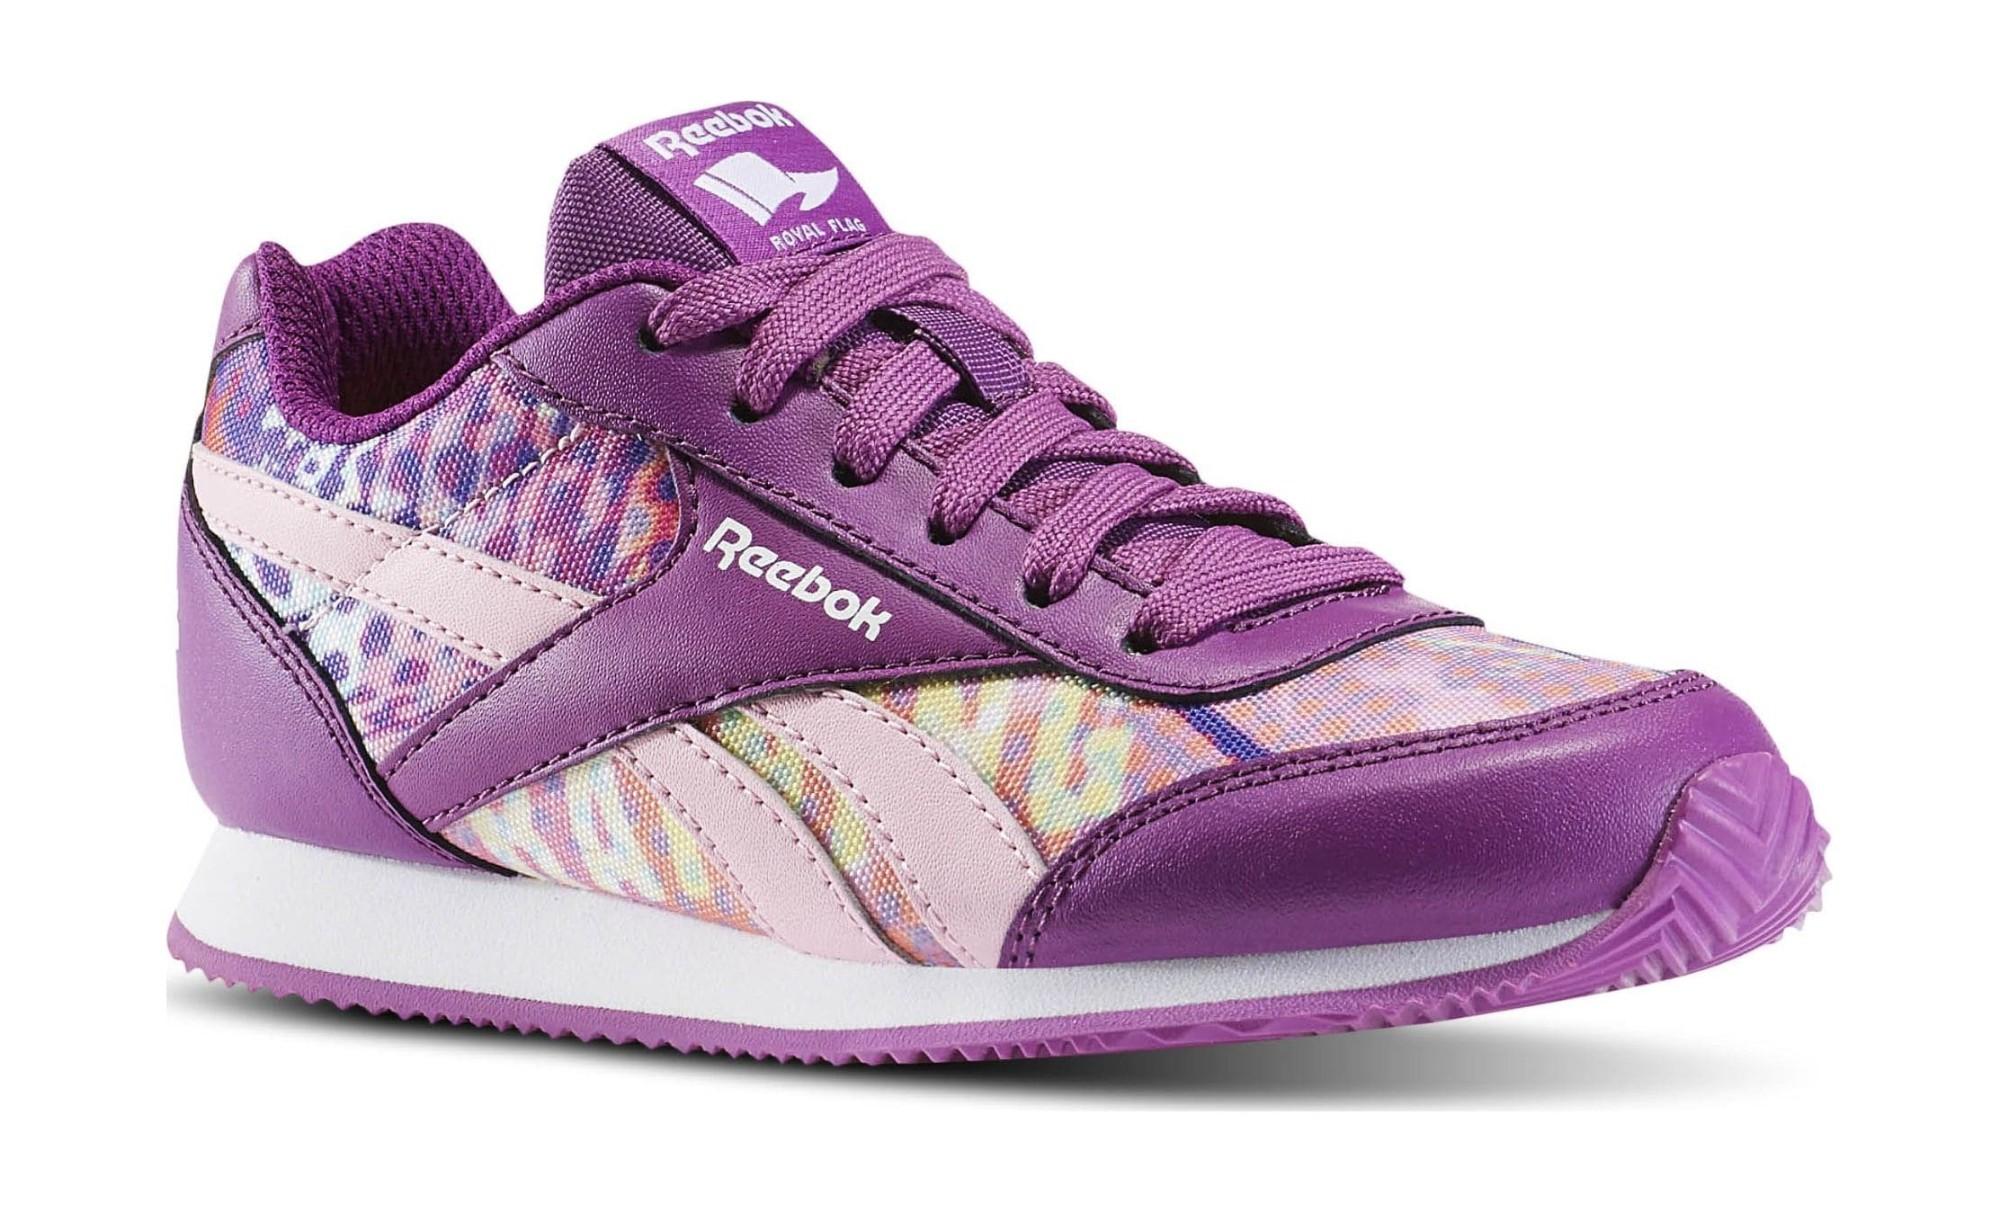 2bb6168c65367 ... REEBOK Royal Classic Jogger Aubergine Stellar Pink ...